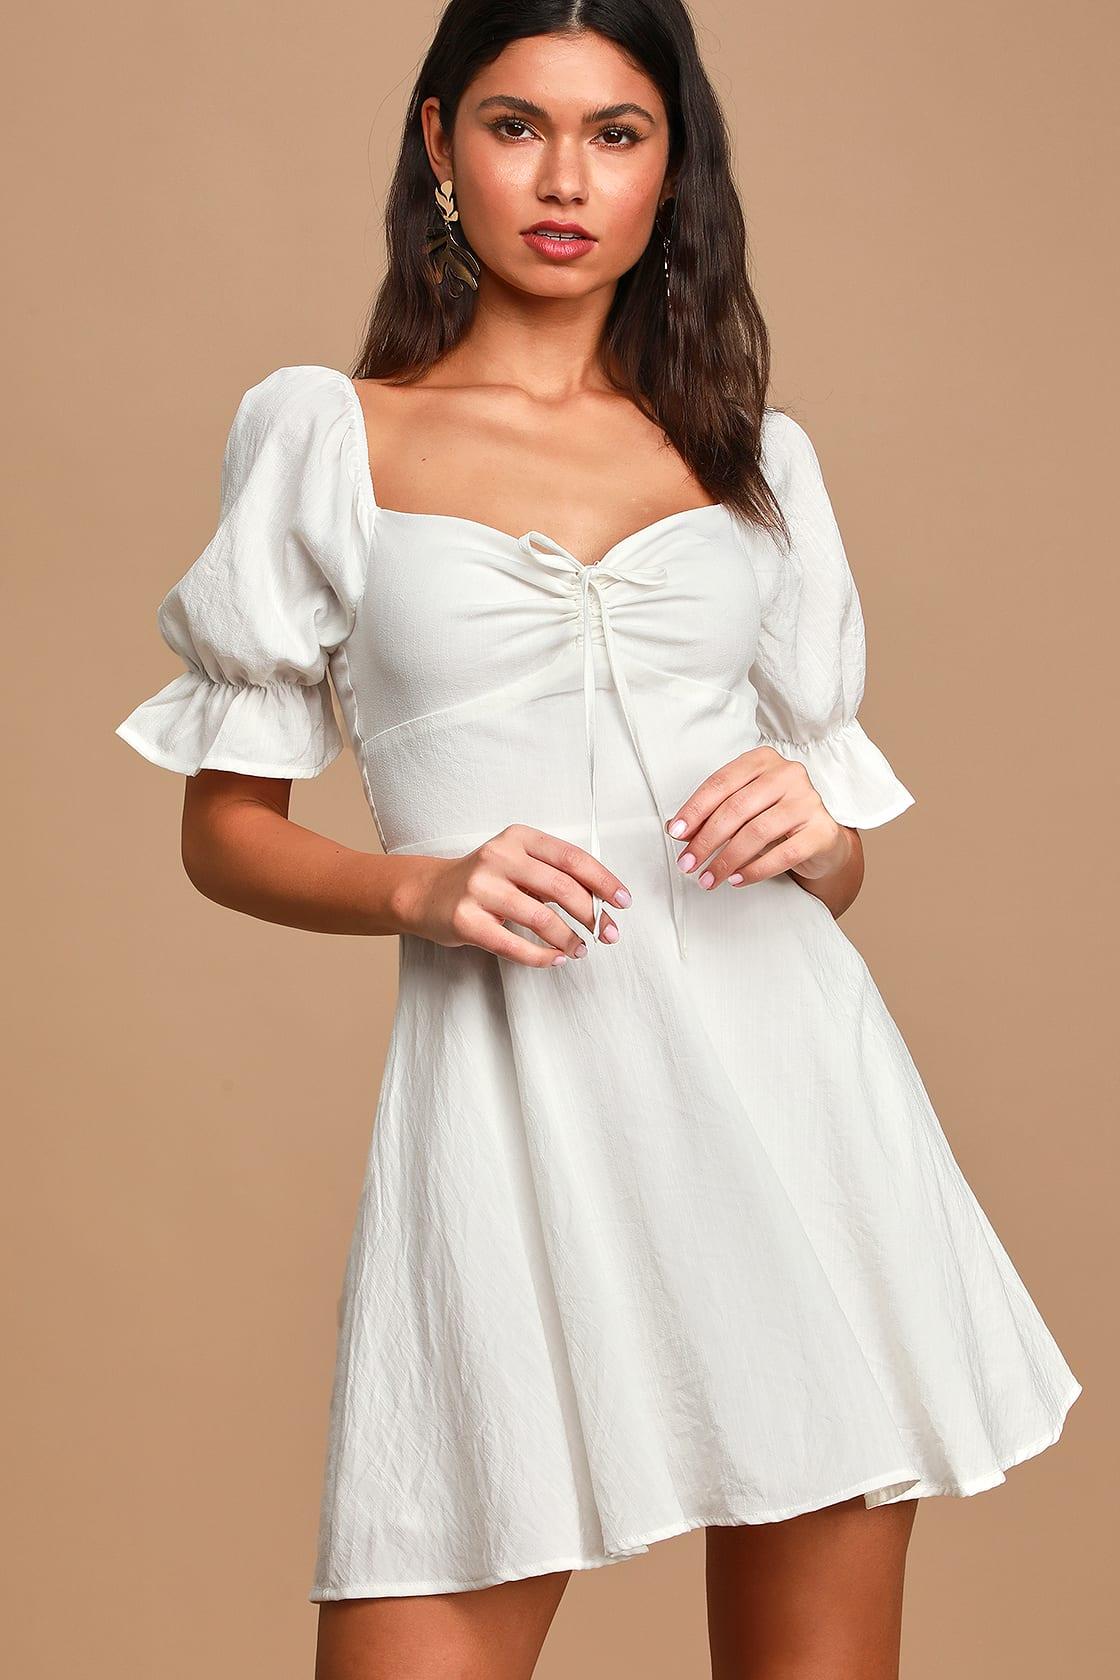 Cute casual white dress